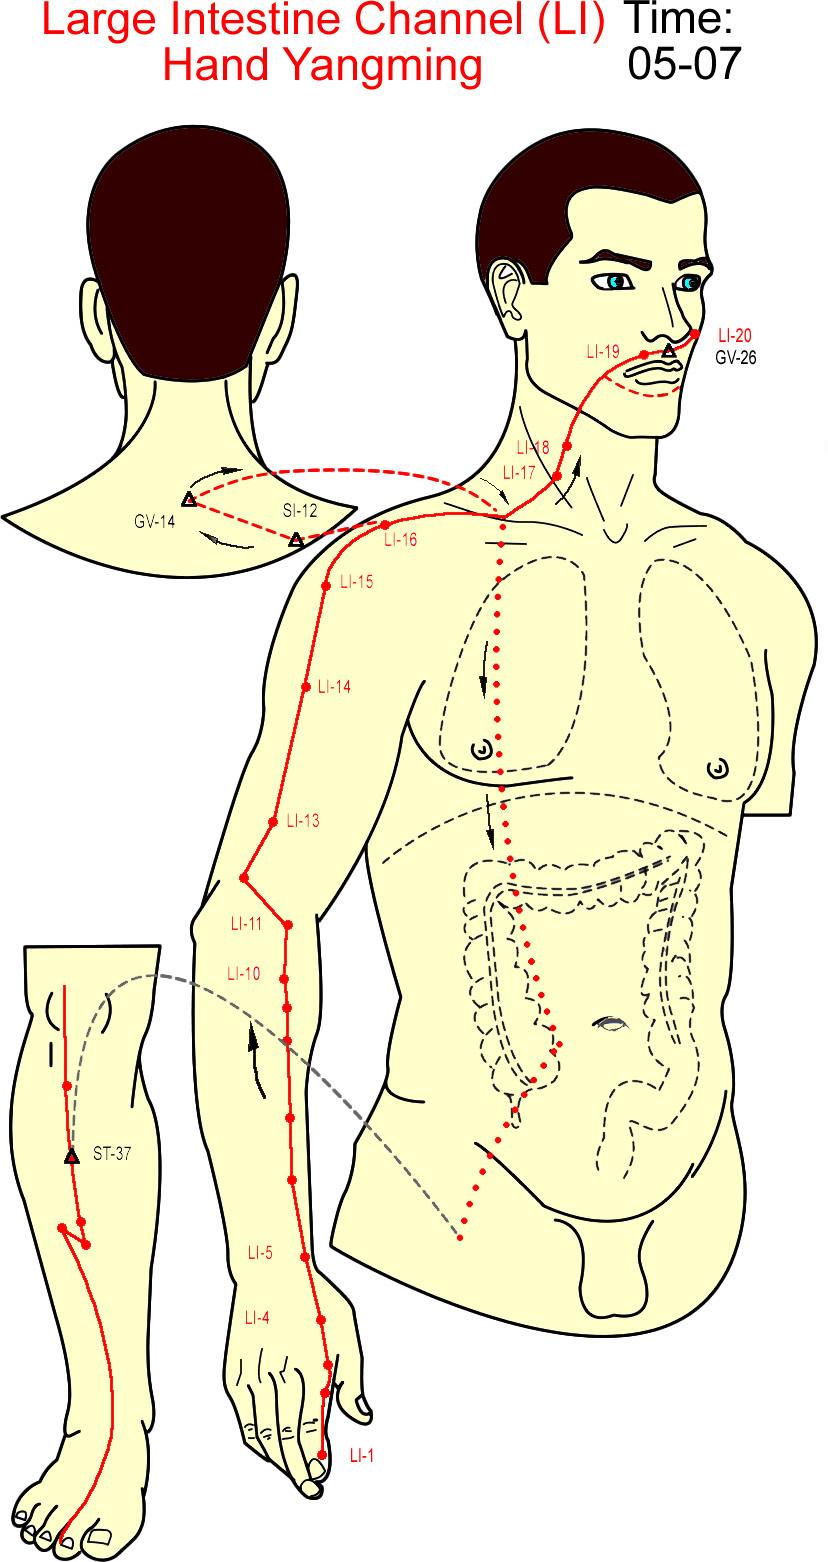 meridian usus besar - large intestine